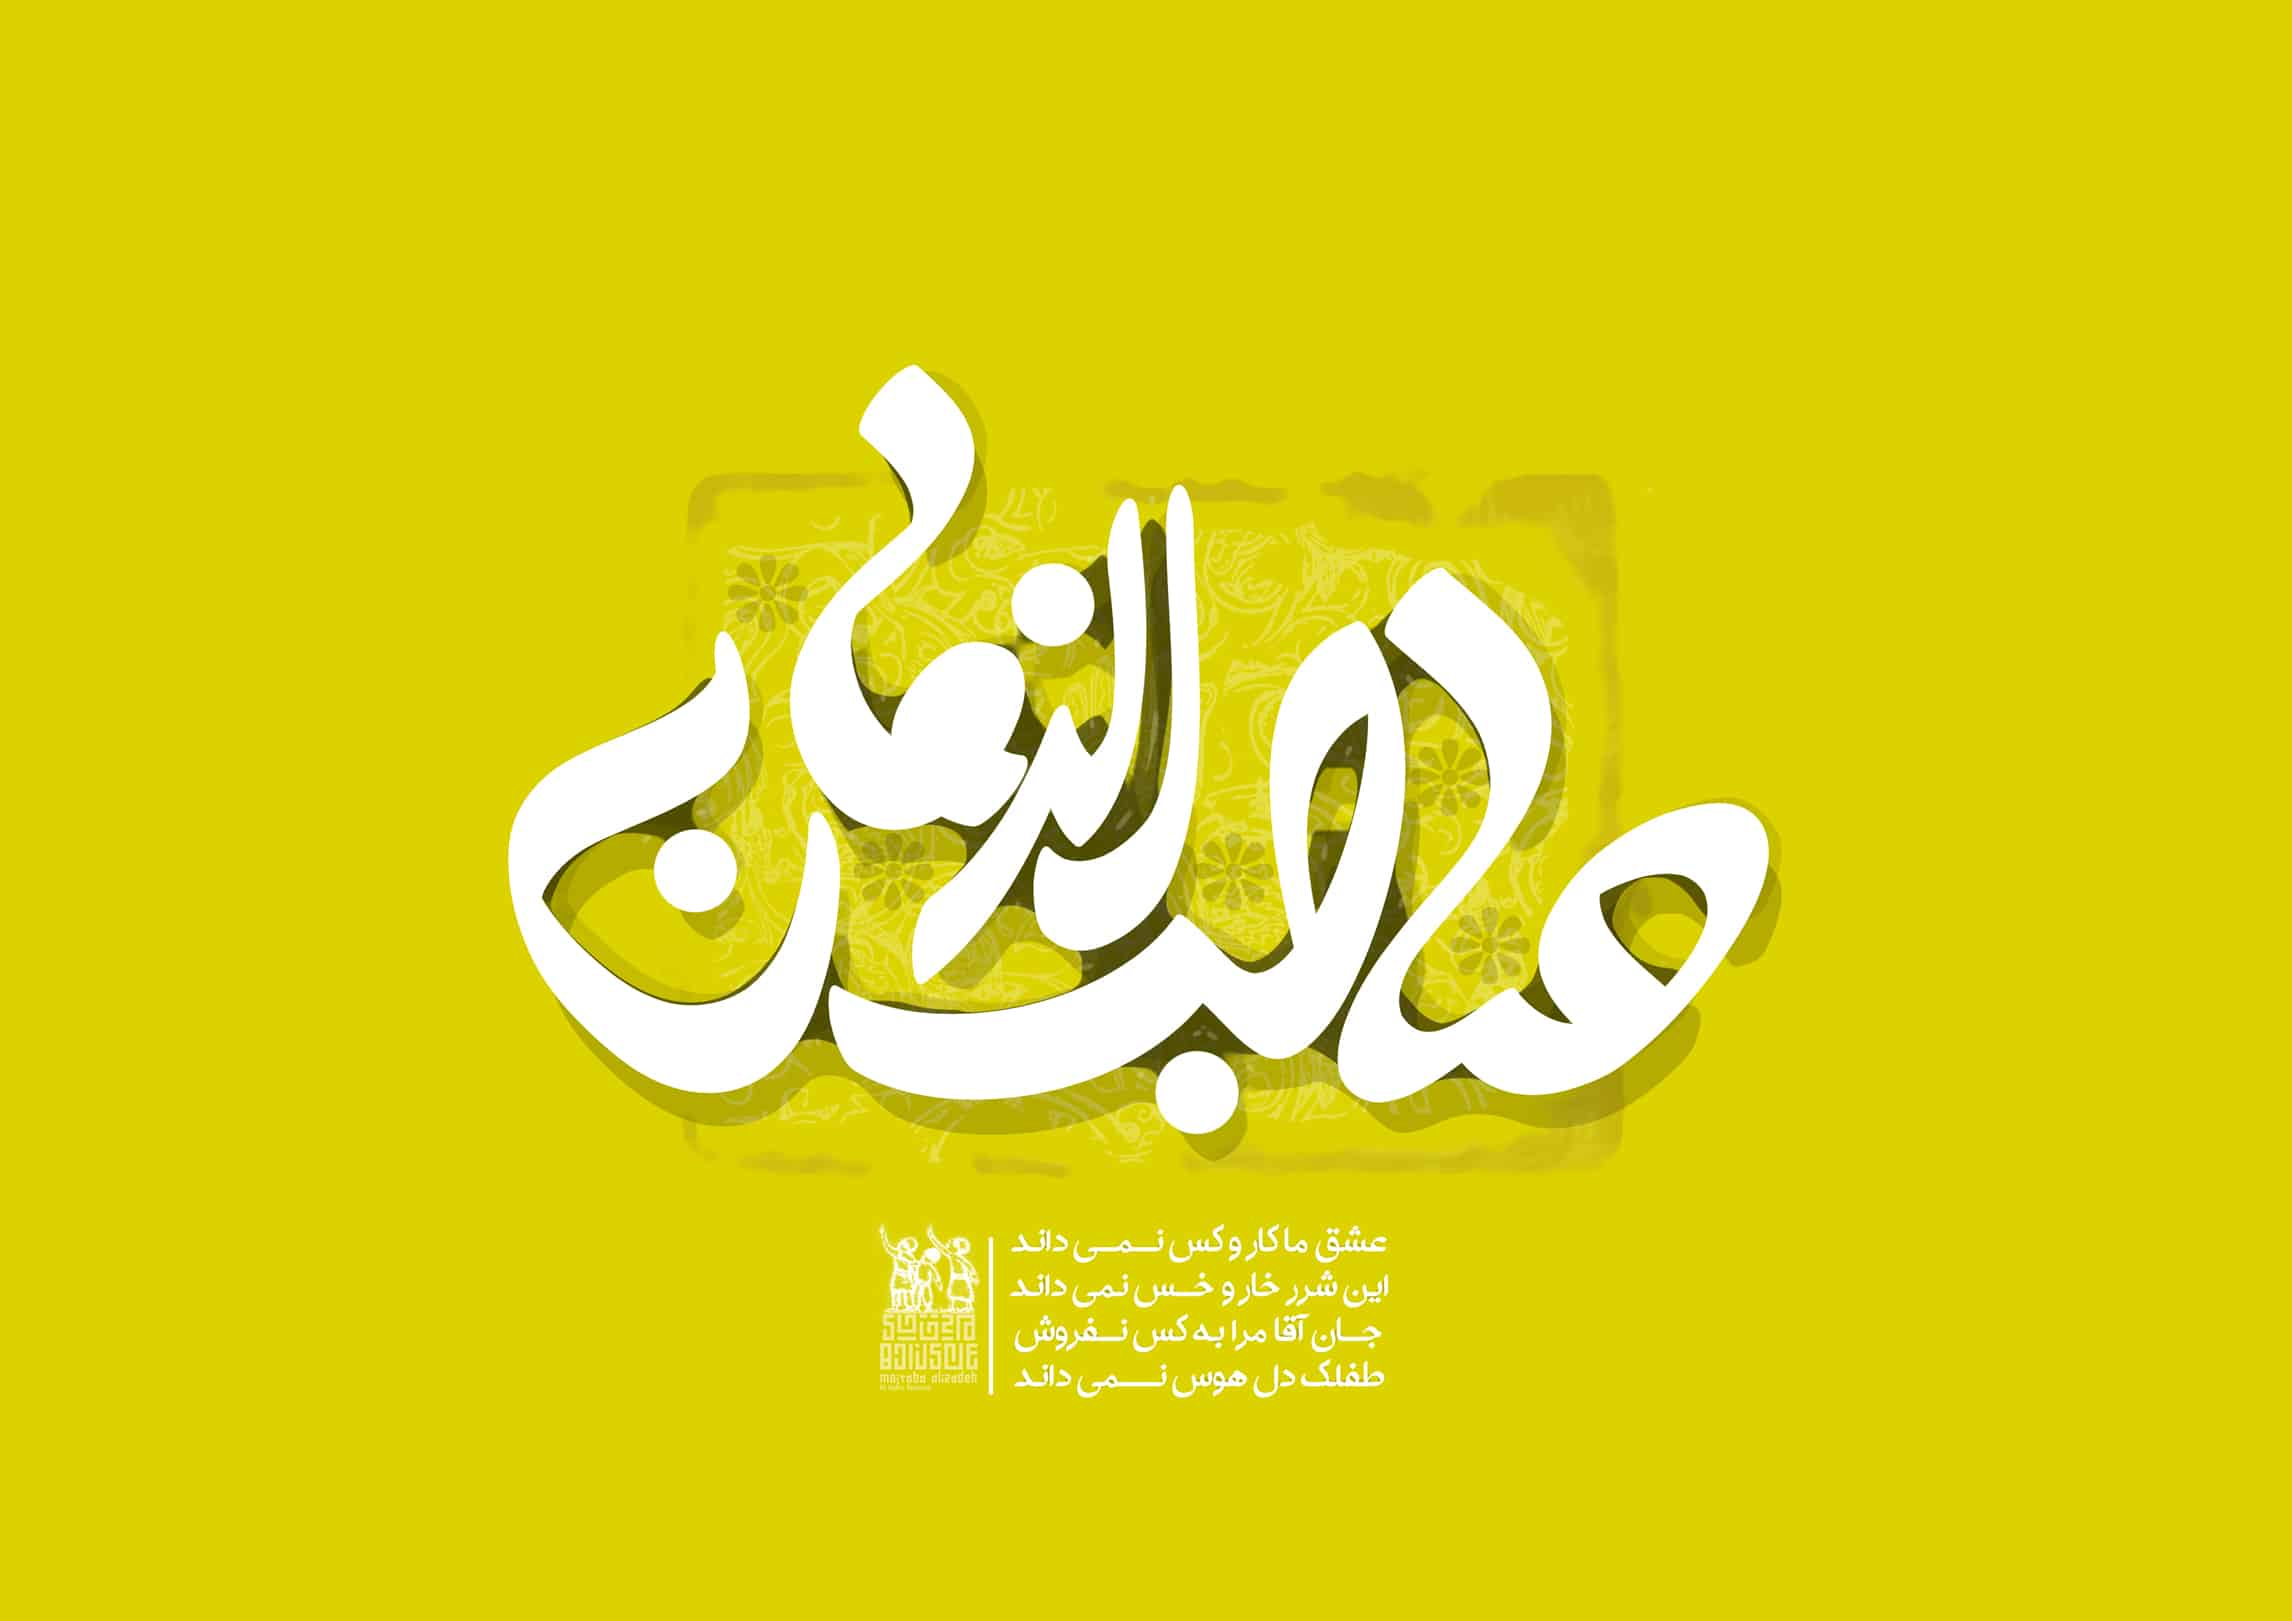 vazayef zohoor 2 1 - وظایف منتظران ظهور